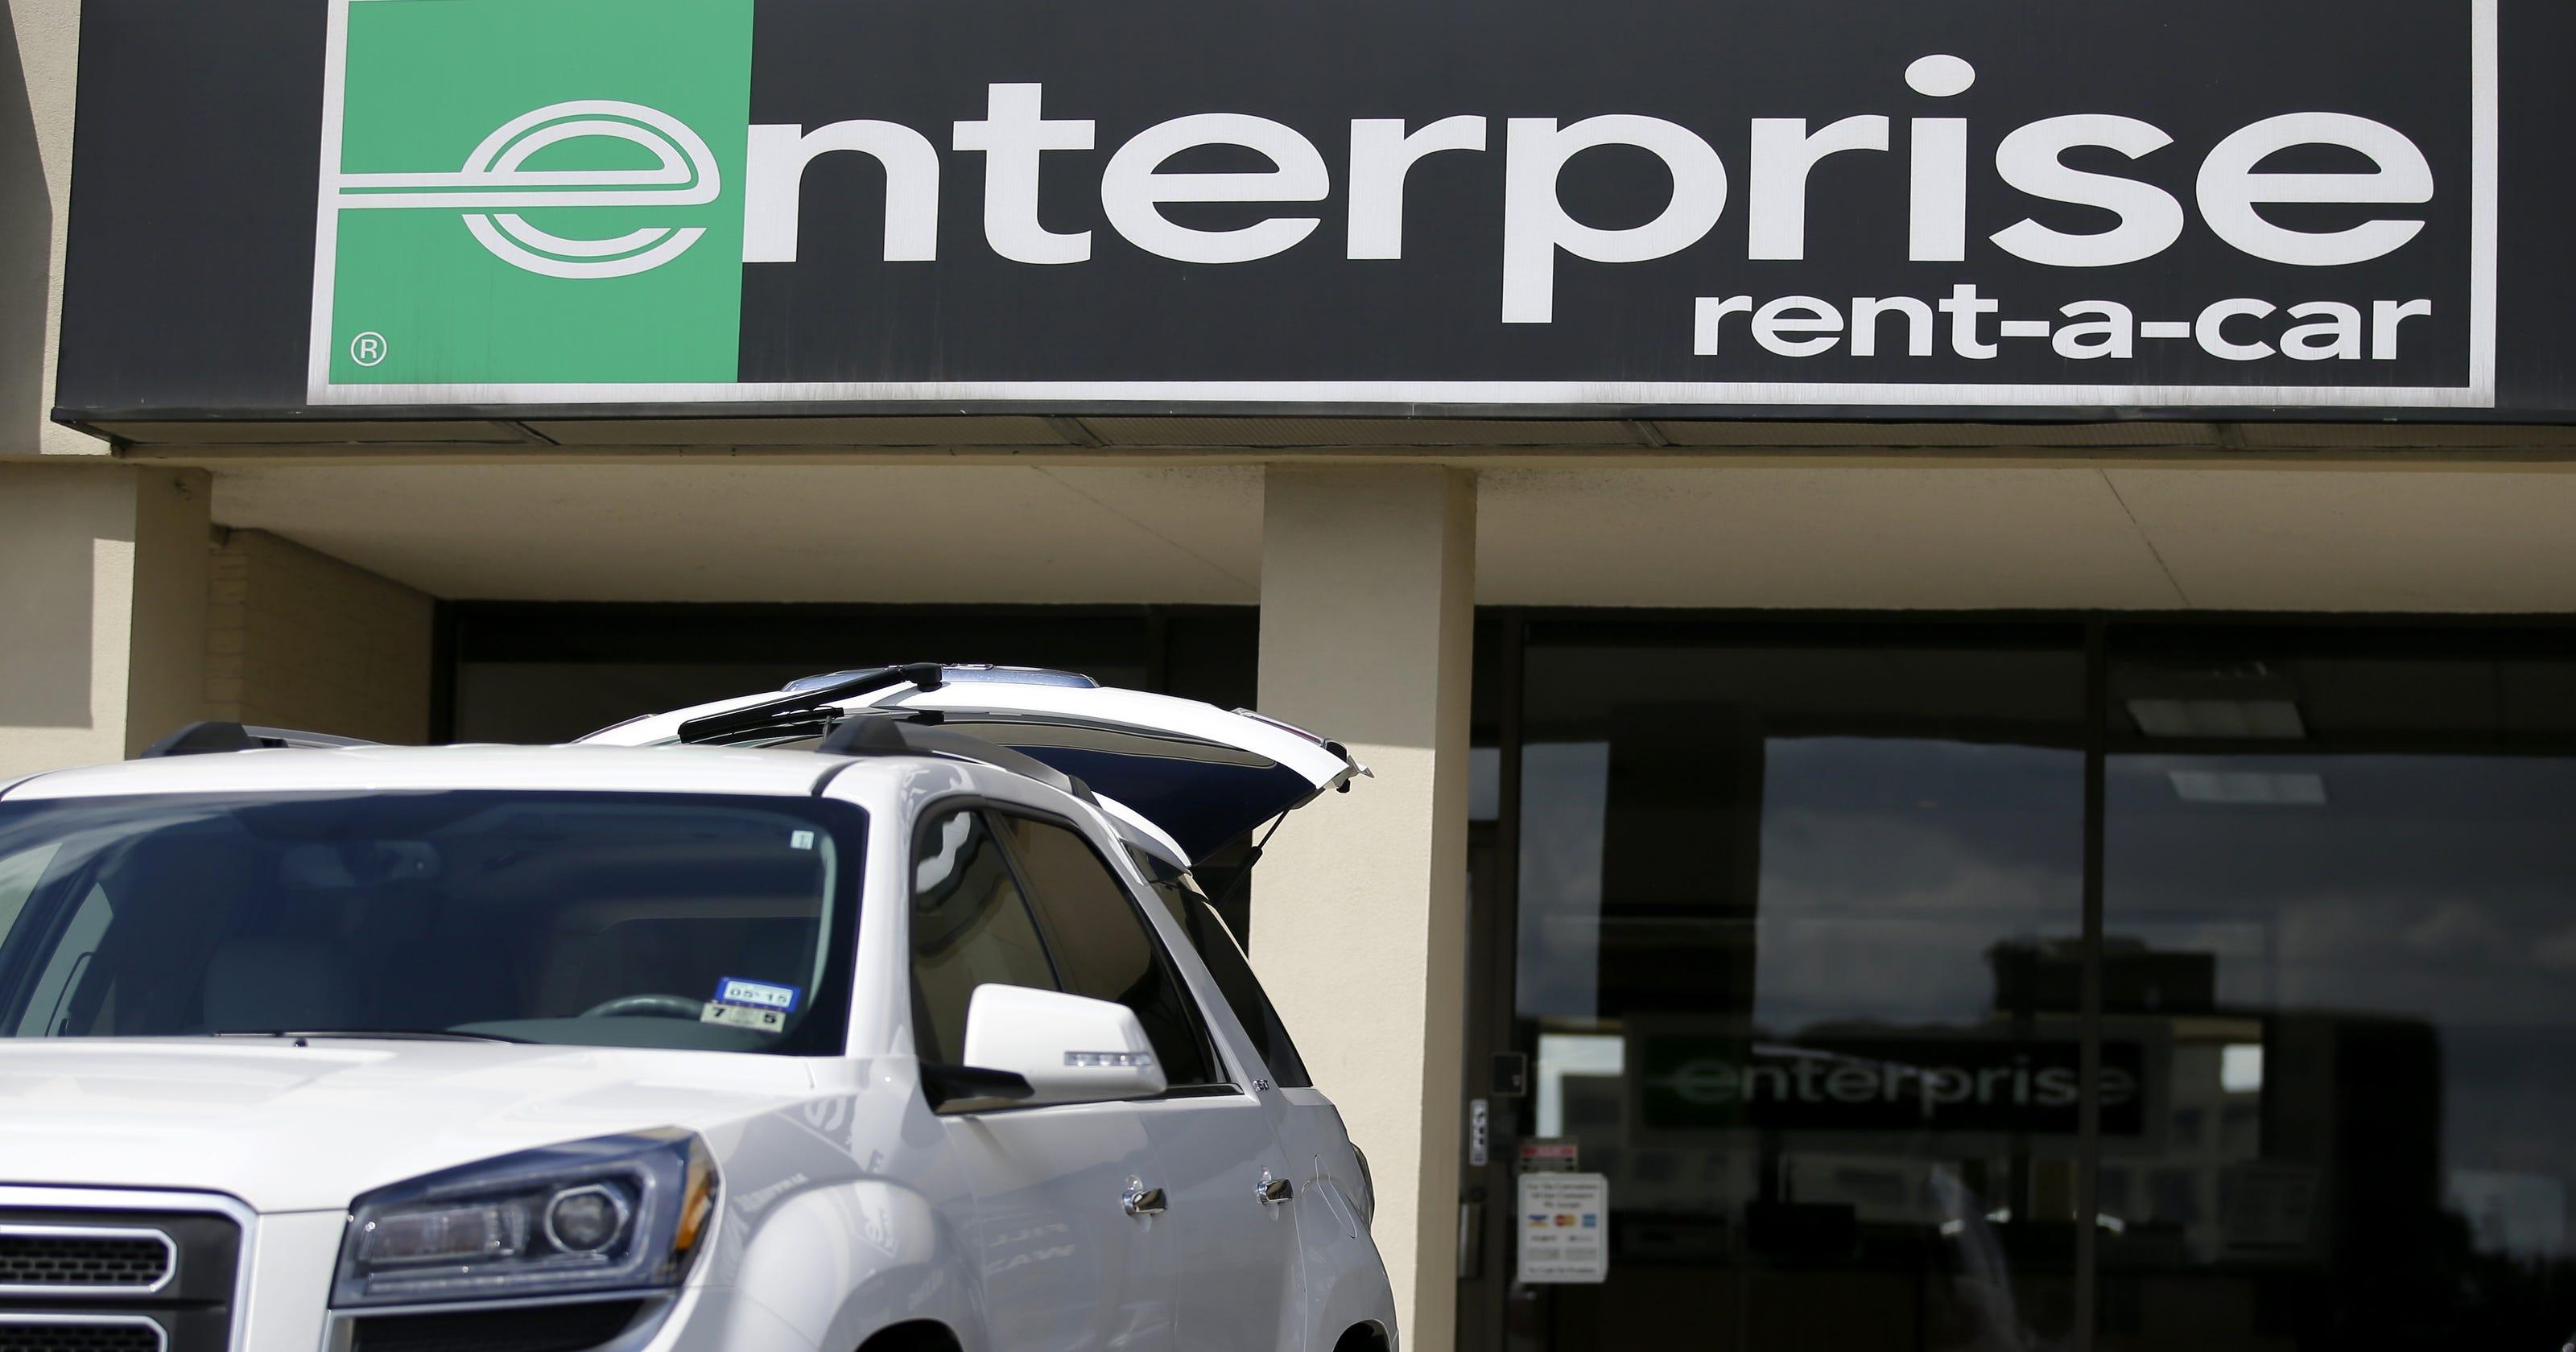 Local Enterprise Car Rental